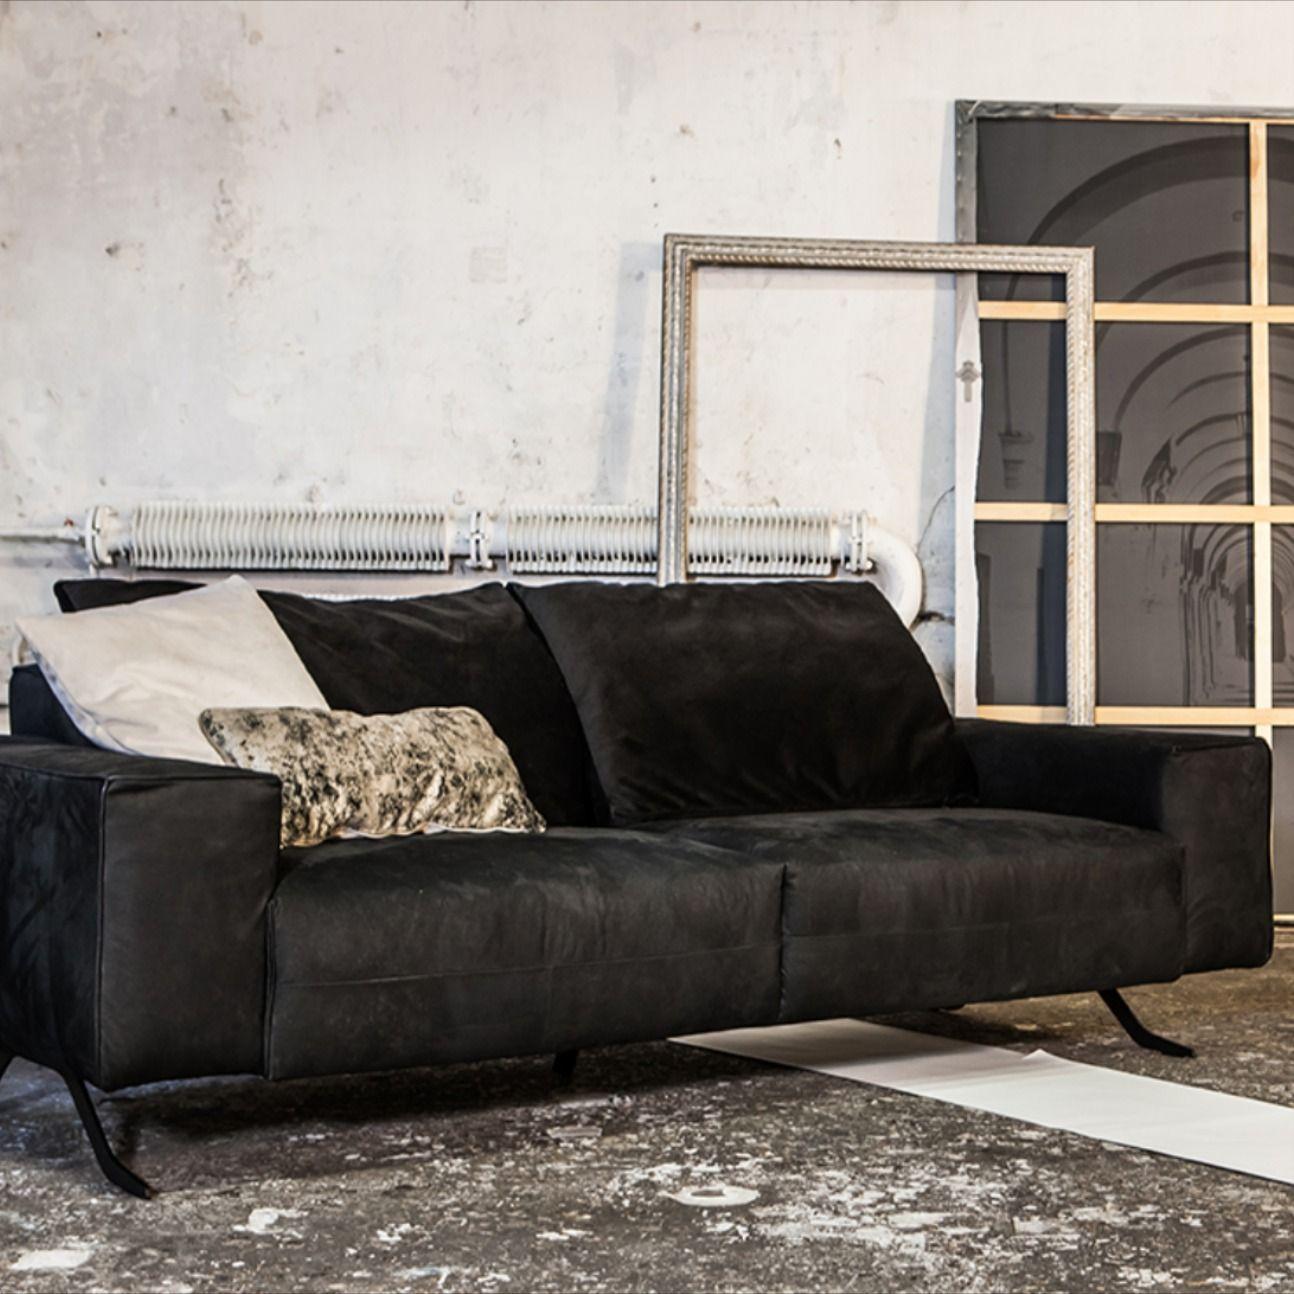 #designwerk #firstclassliving #sofa #furniture #highqualitysofa #designersofa #handmade #ambient #living #livingroom #home #homestyle #homedesign #chicliving #luxury #firstclasscomfort #comfortsofa #relax #firstclass  #couch #highqualitycouach #designwerkag #blackbeauty #blacksofa #designwerkbeauty #beauty